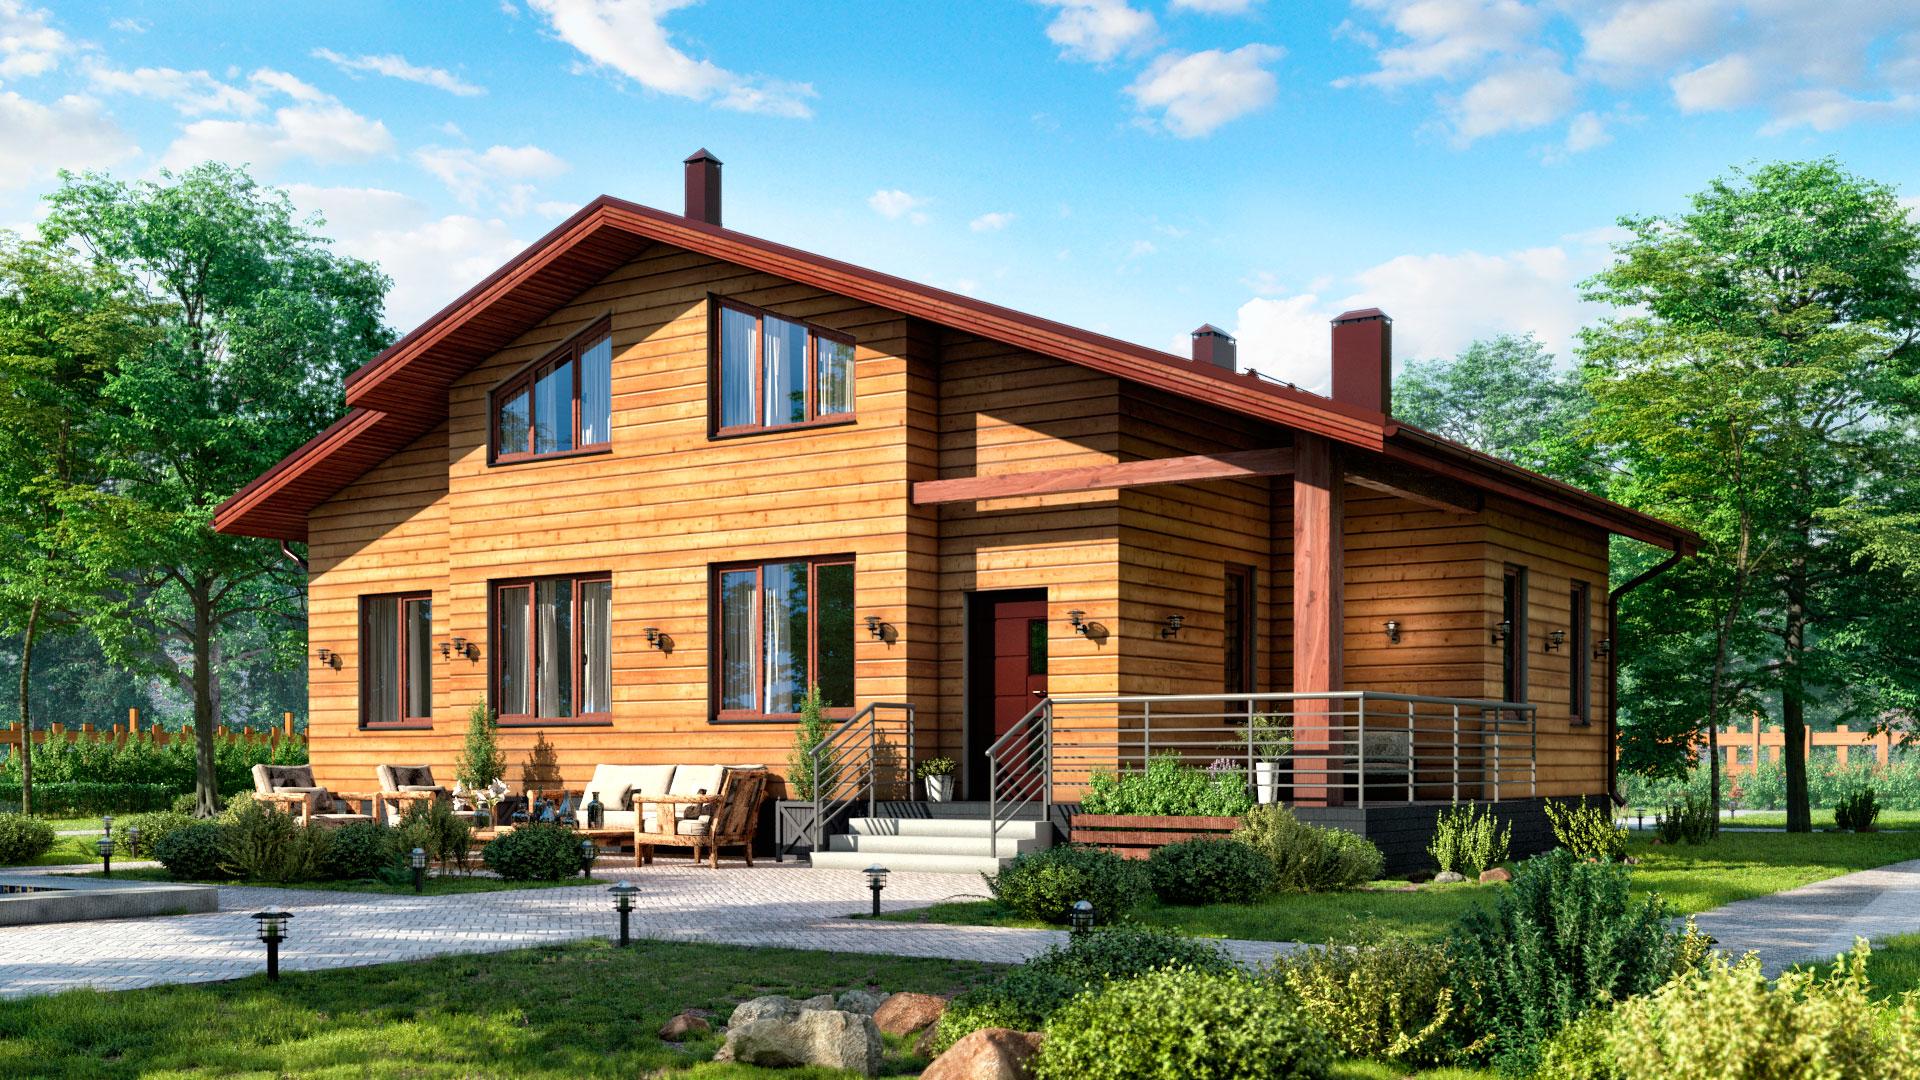 Передний фасад двухэтажного дачного дома проект БП-143 127,70 м2.